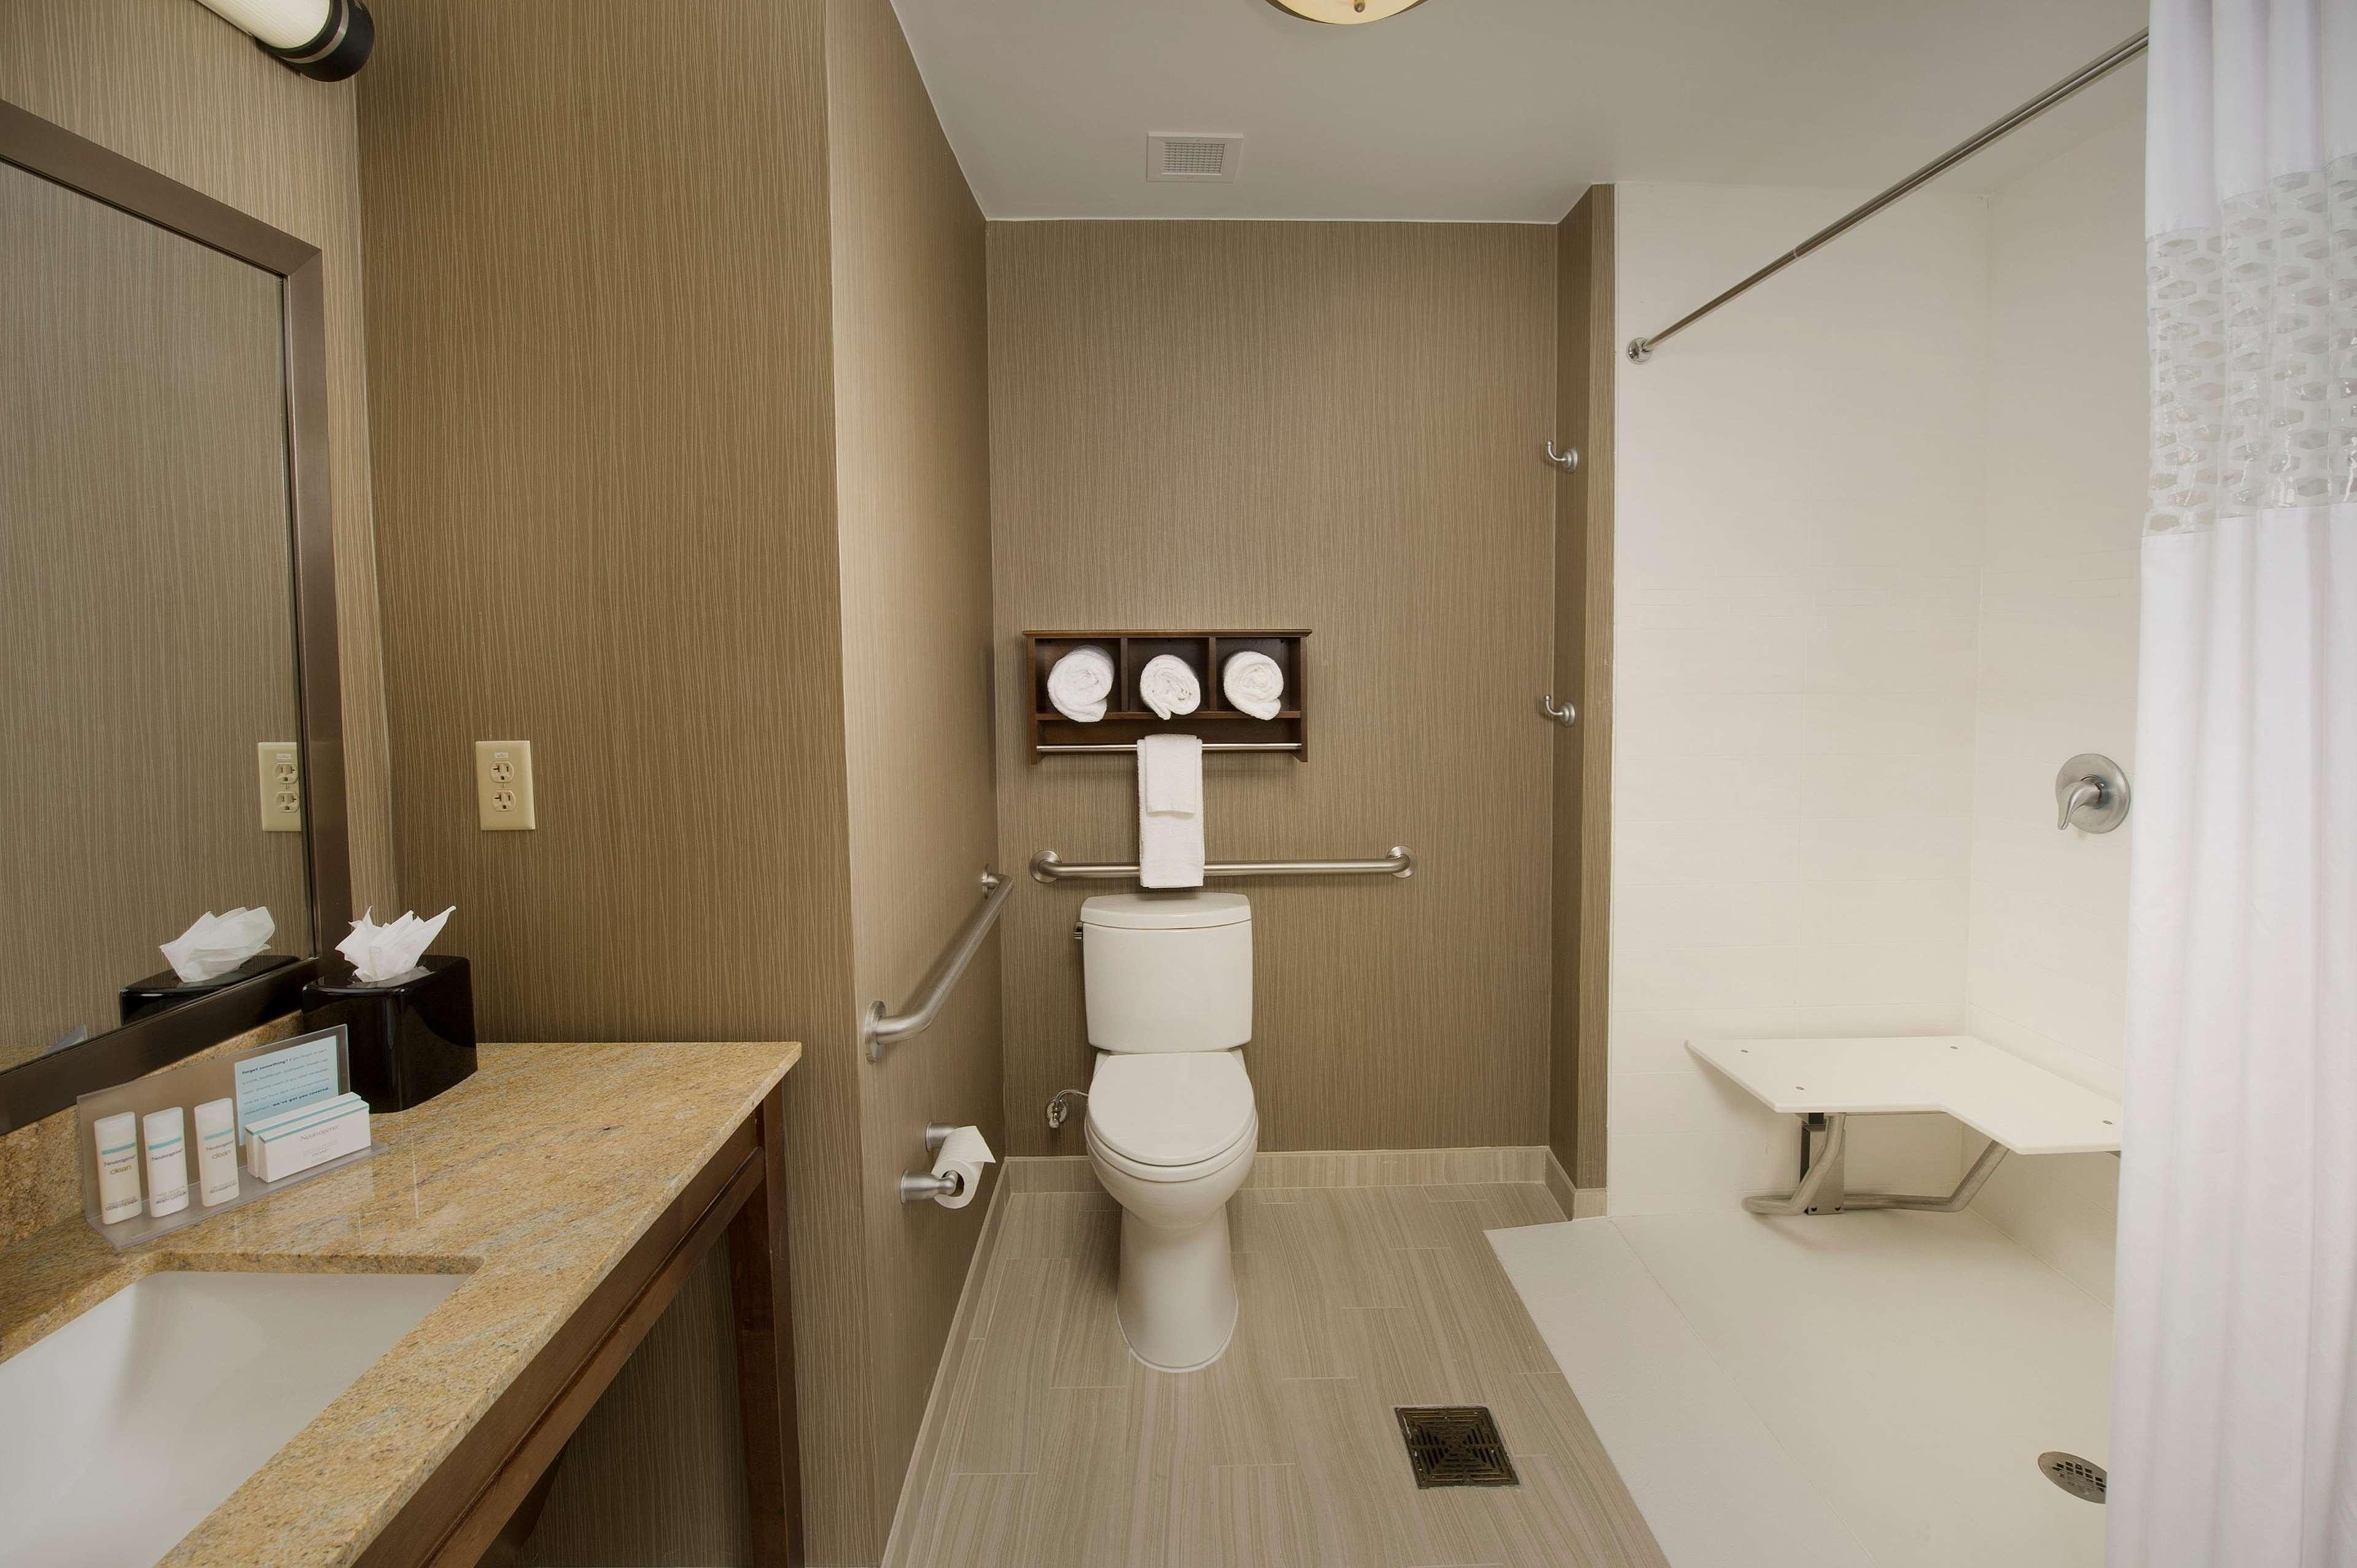 Hampton Inn & Suites San Antonio-Downtown/Market Square image 24